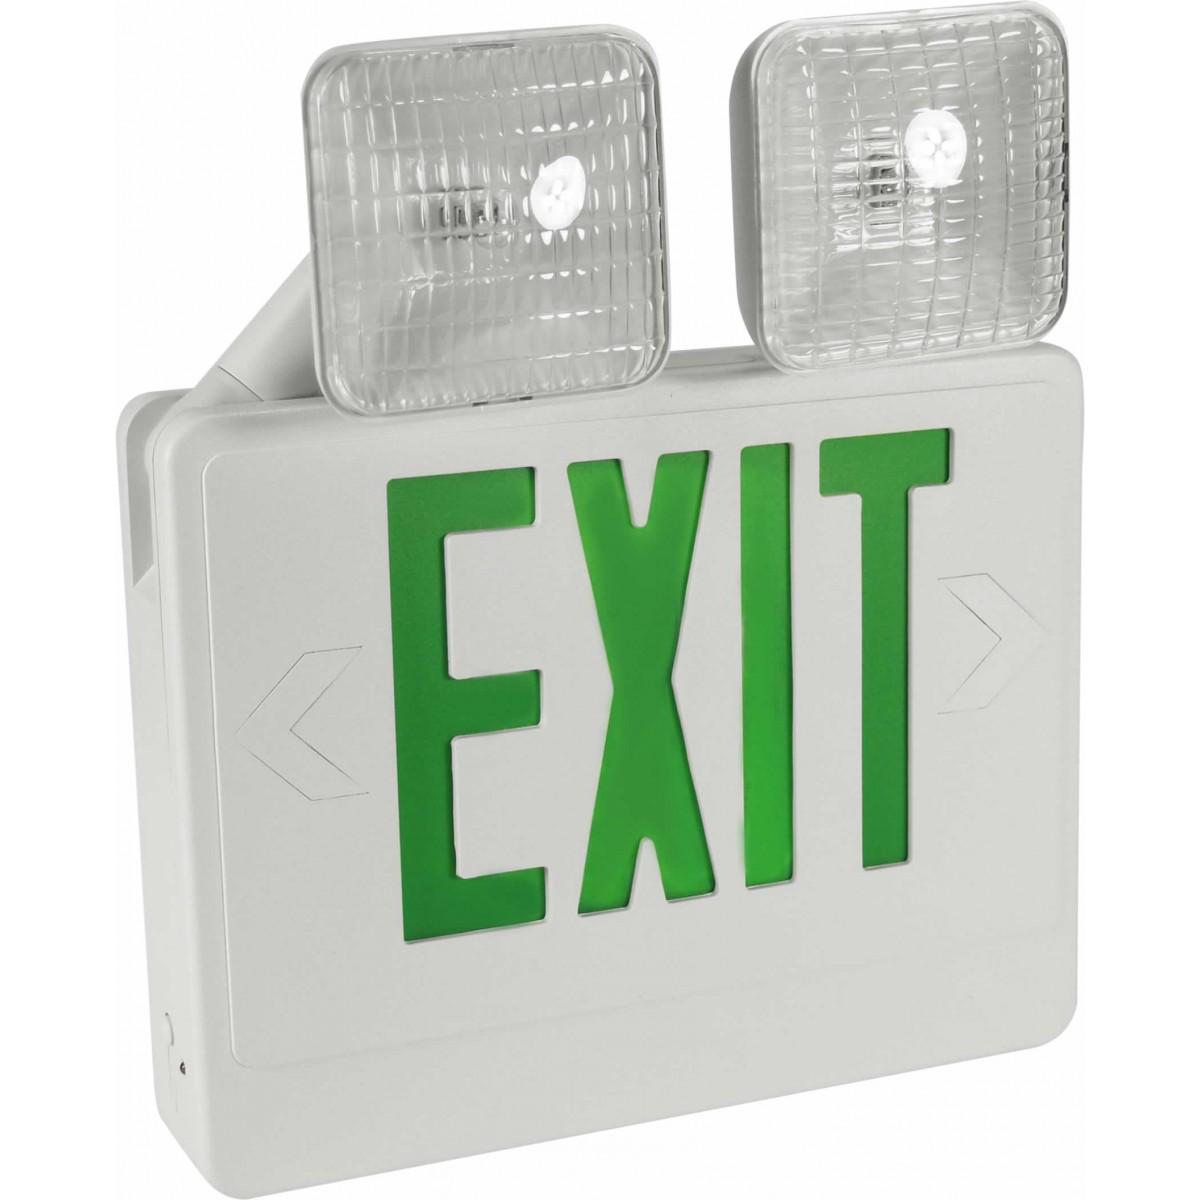 eecla exit sign emergency light combo exit. Black Bedroom Furniture Sets. Home Design Ideas